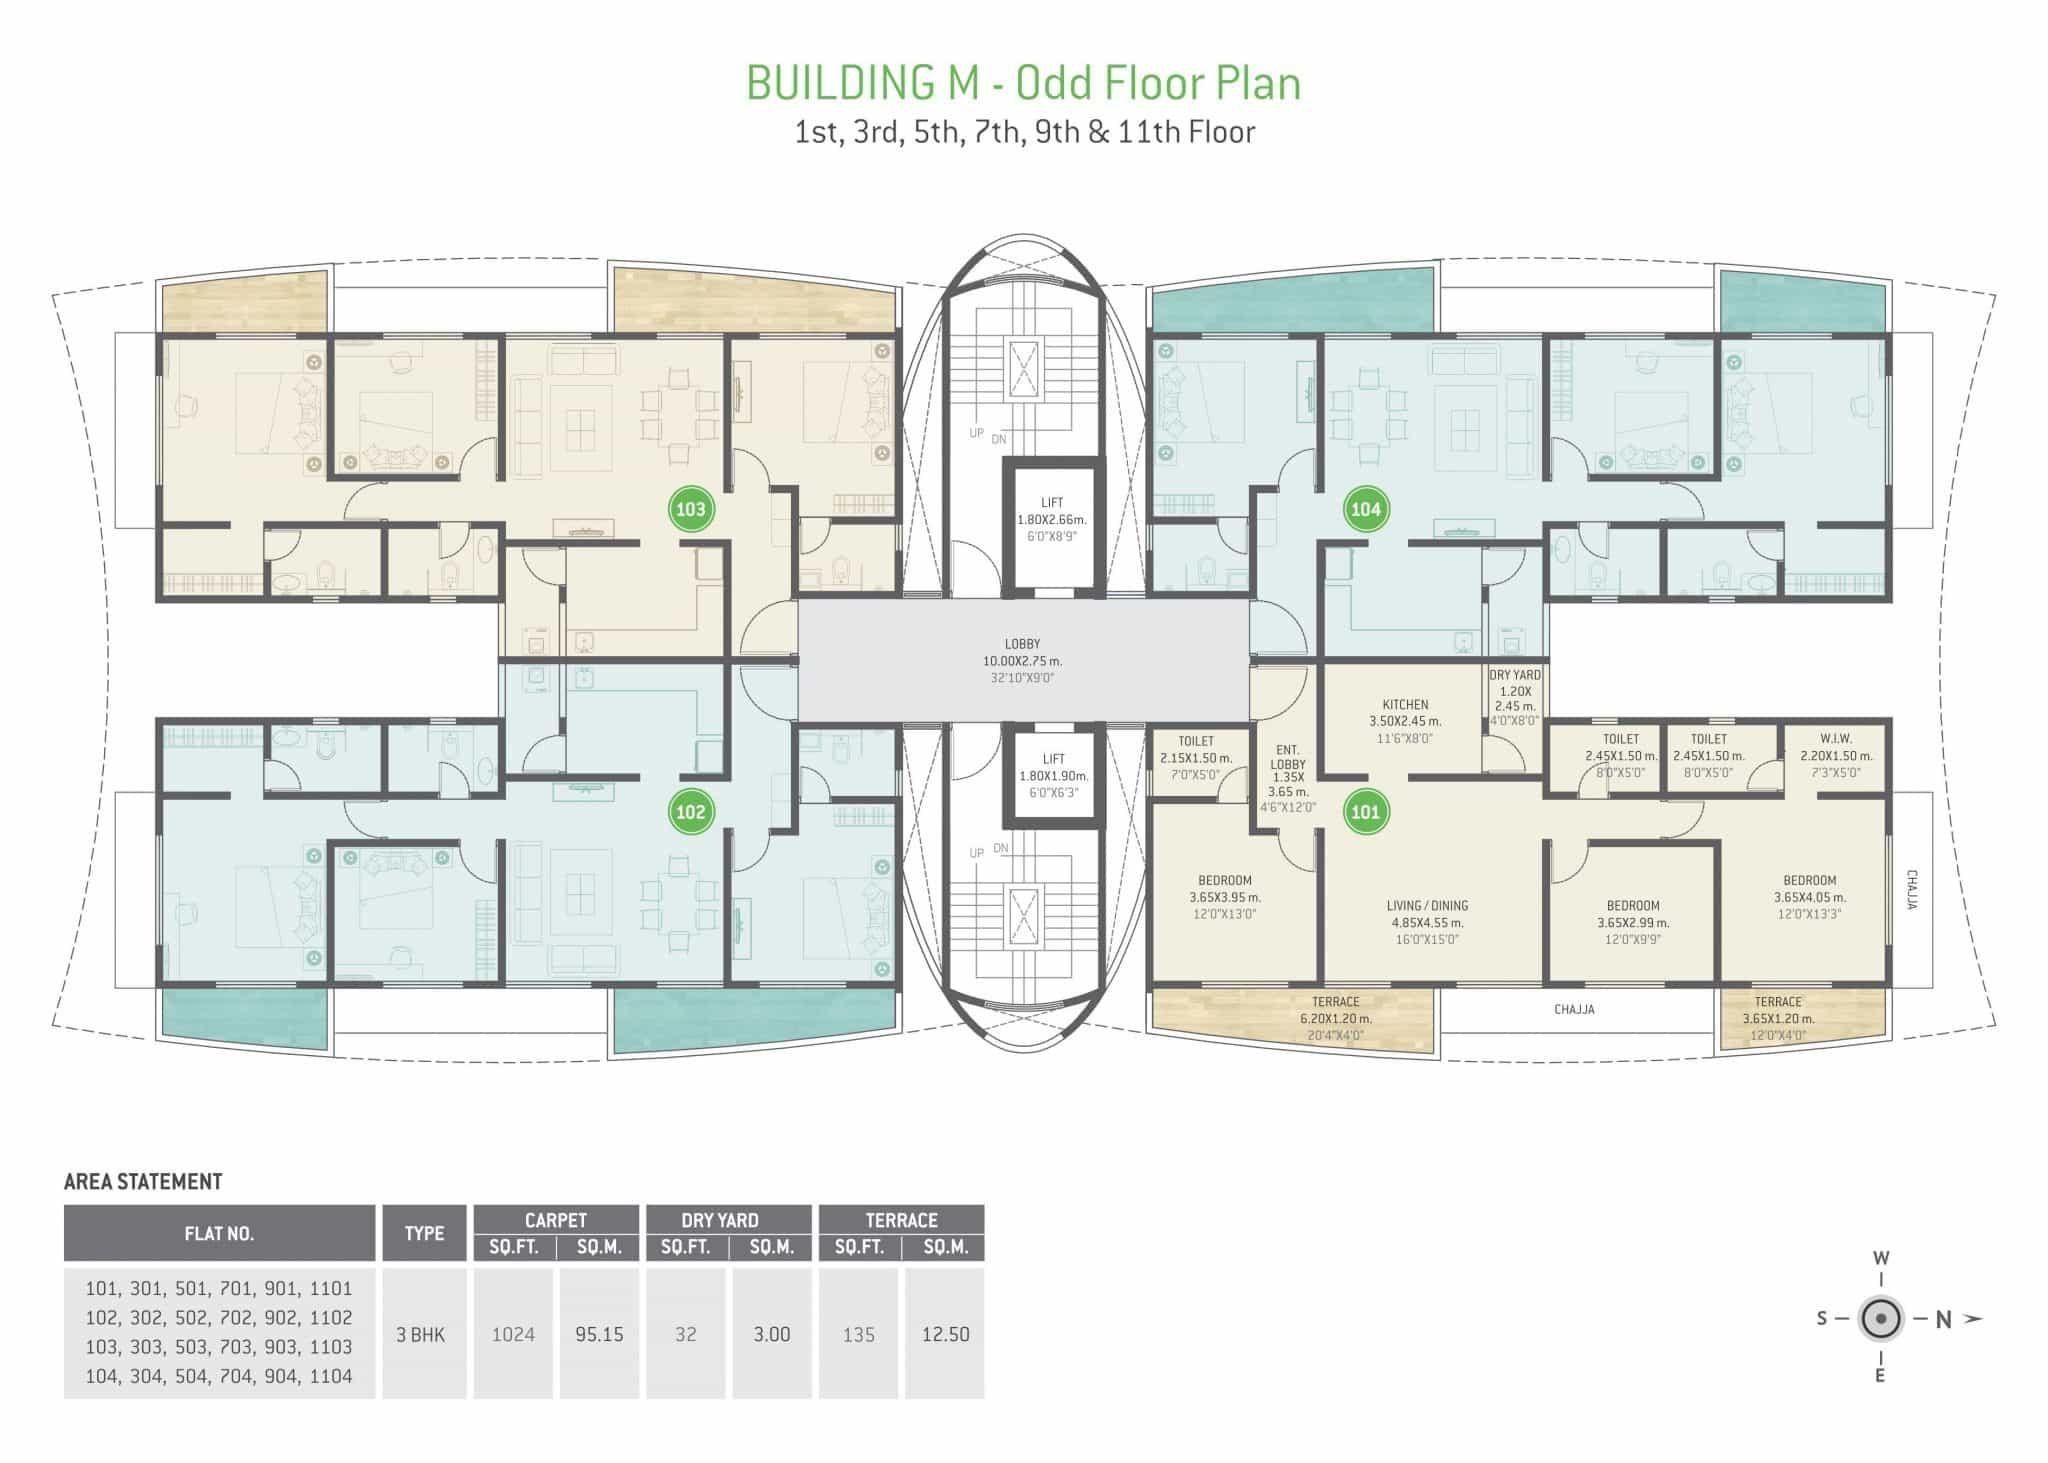 Building M - Odd Floor